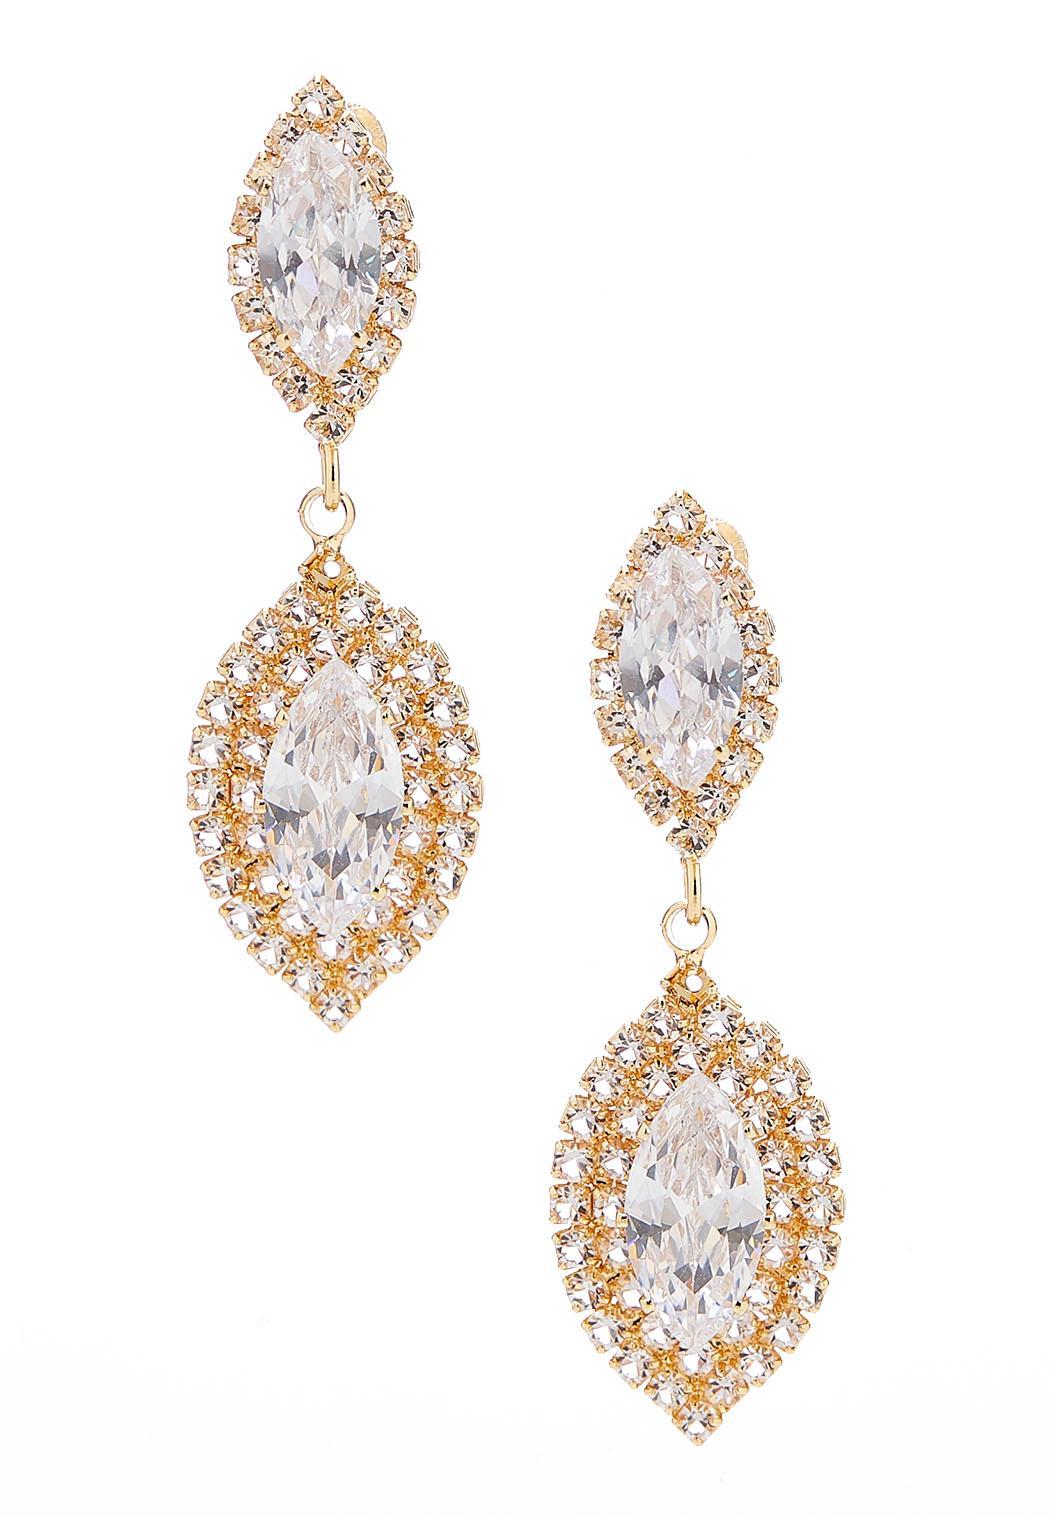 Fairytale Pave Earrings